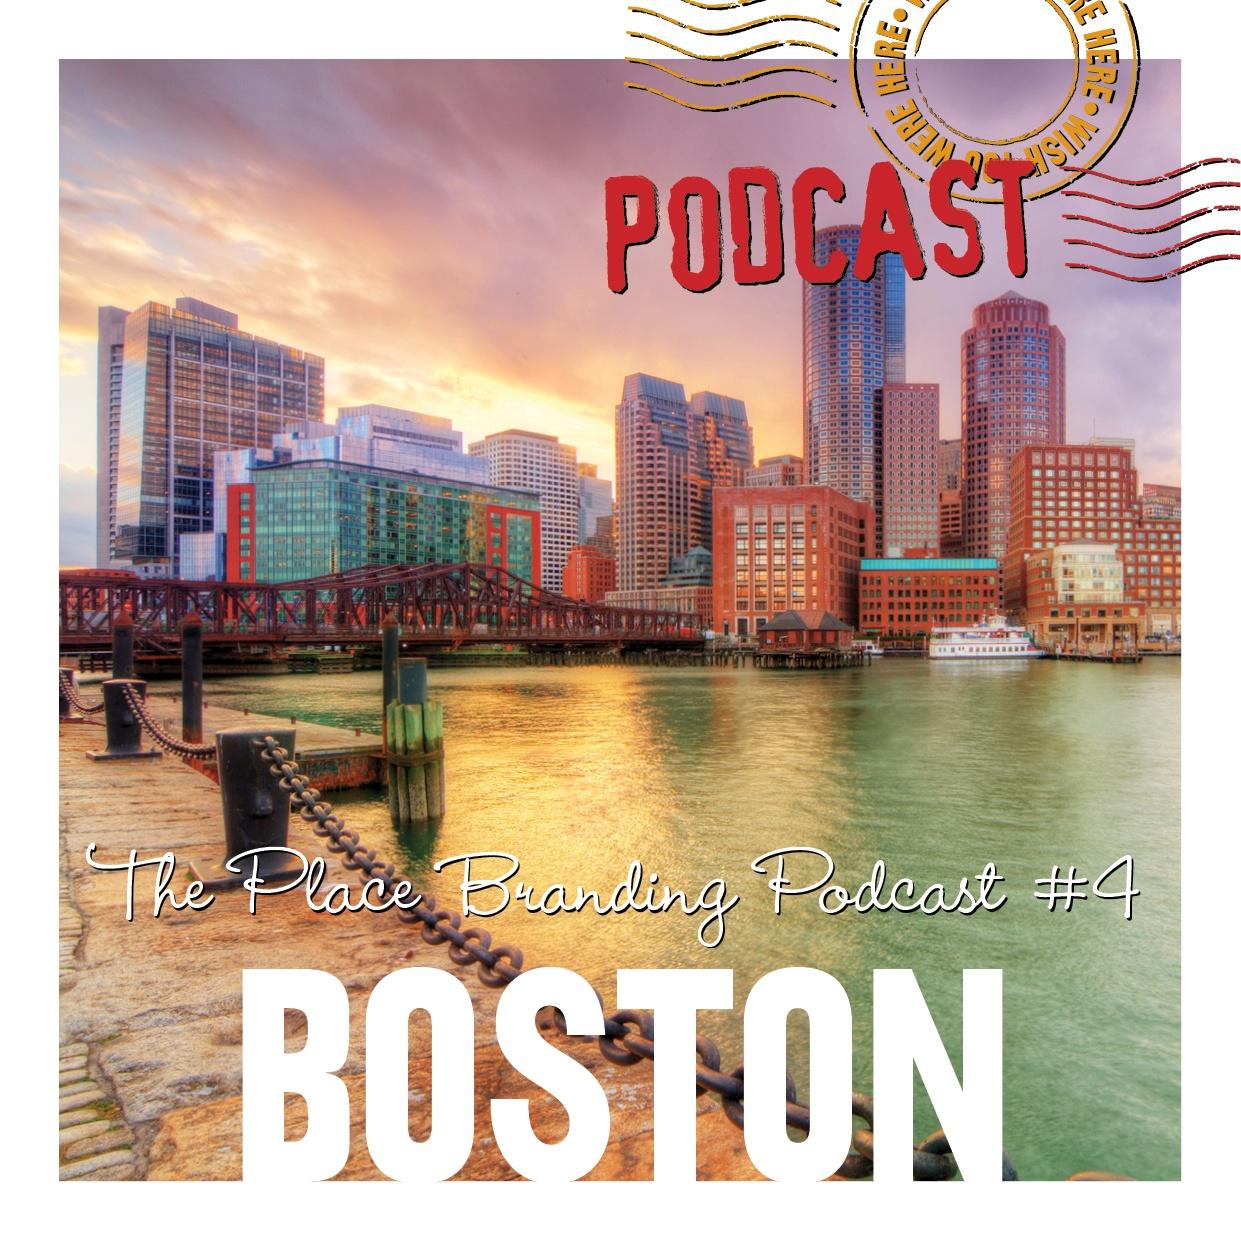 Place Branding Podcast Episode 3 Boston